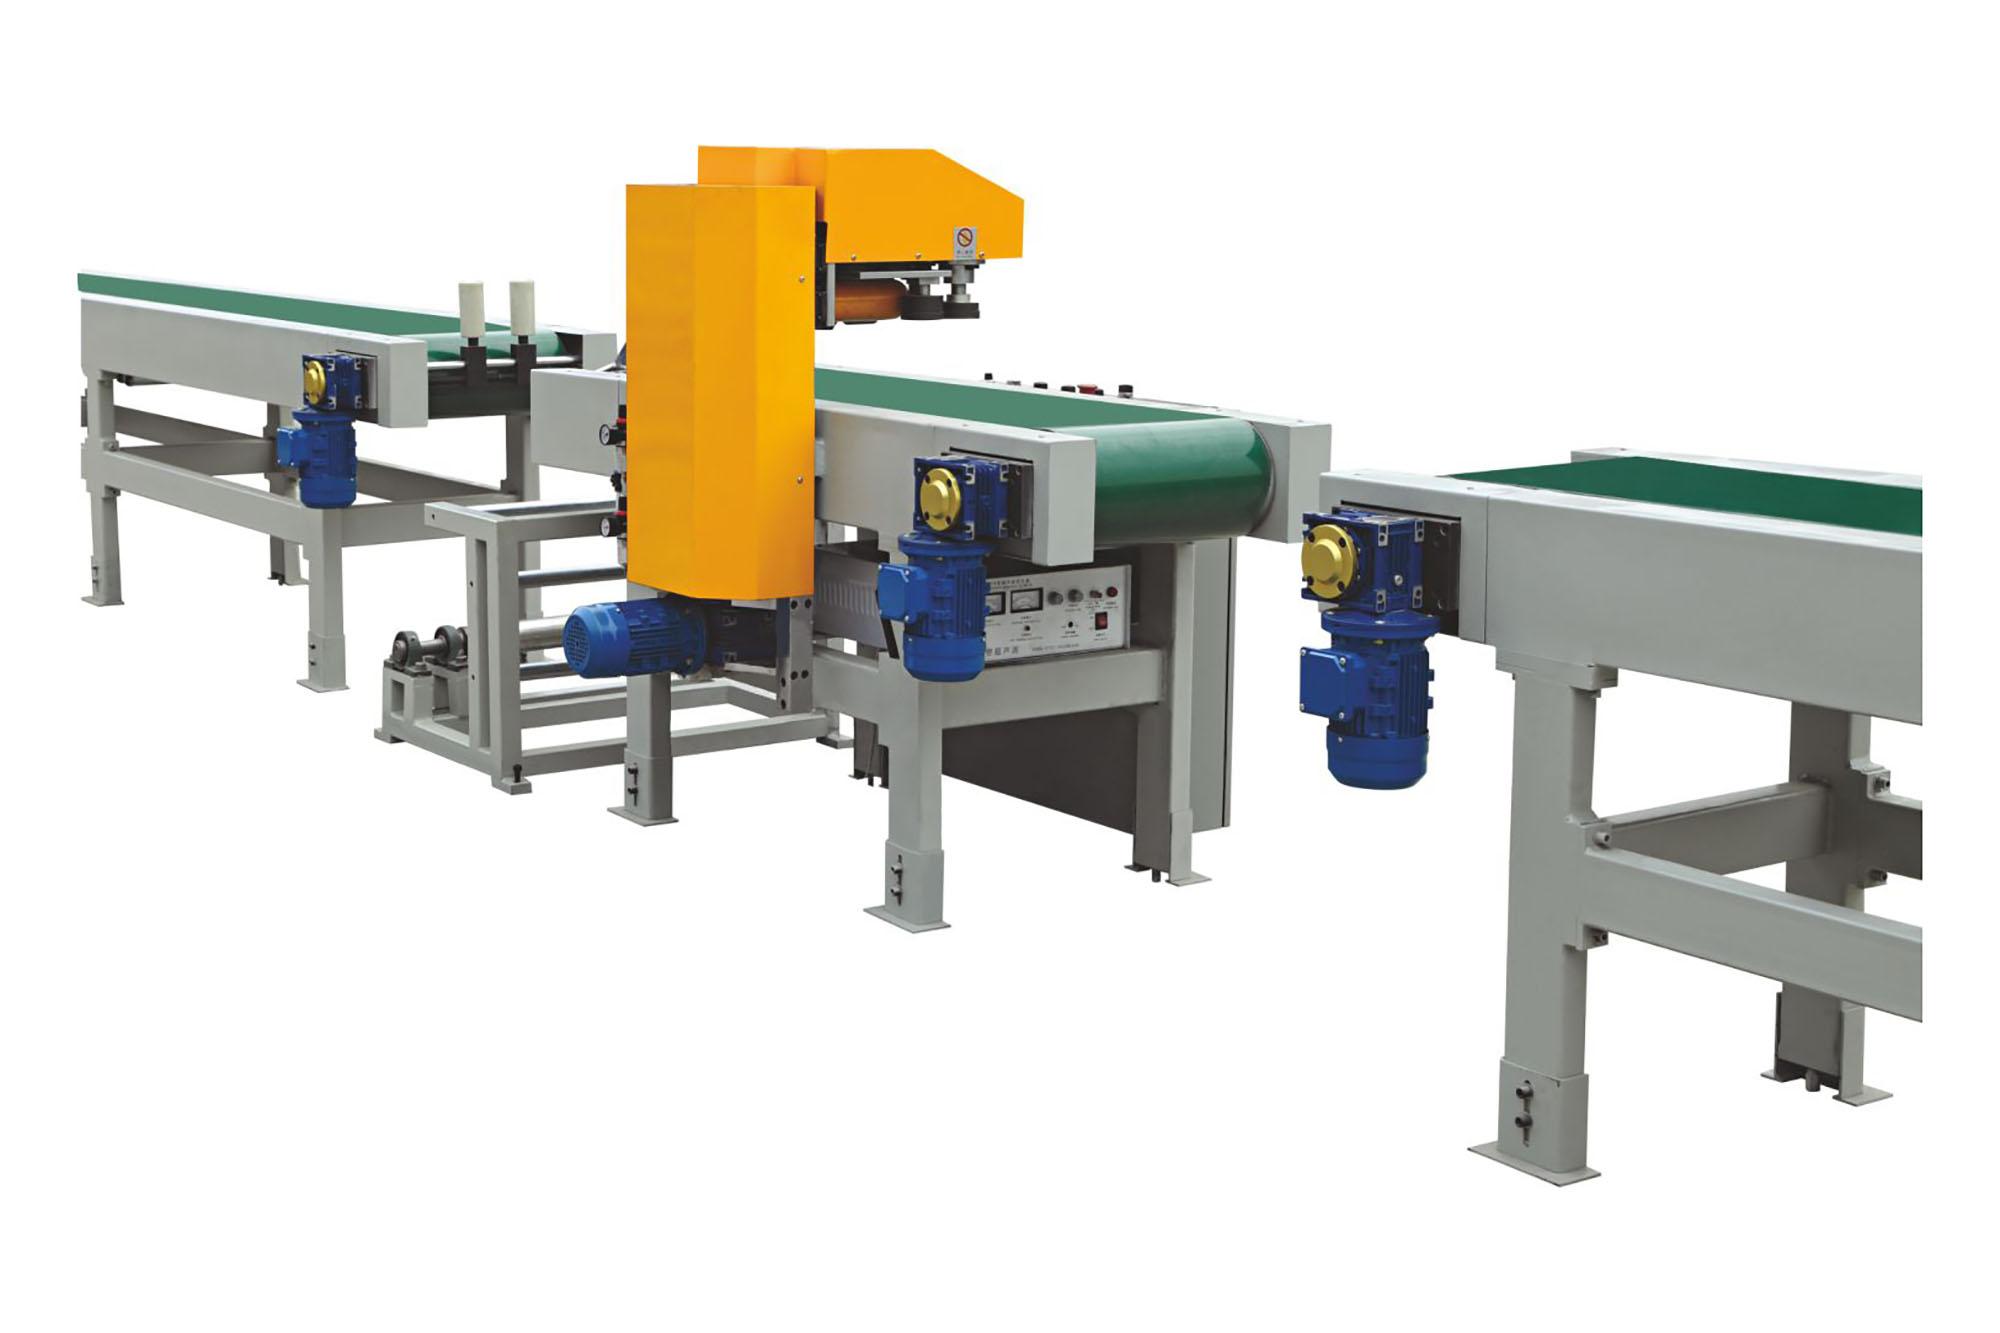 Wangeshi New wrap packing machine manufacturers for ultrasonic auto film welding-1